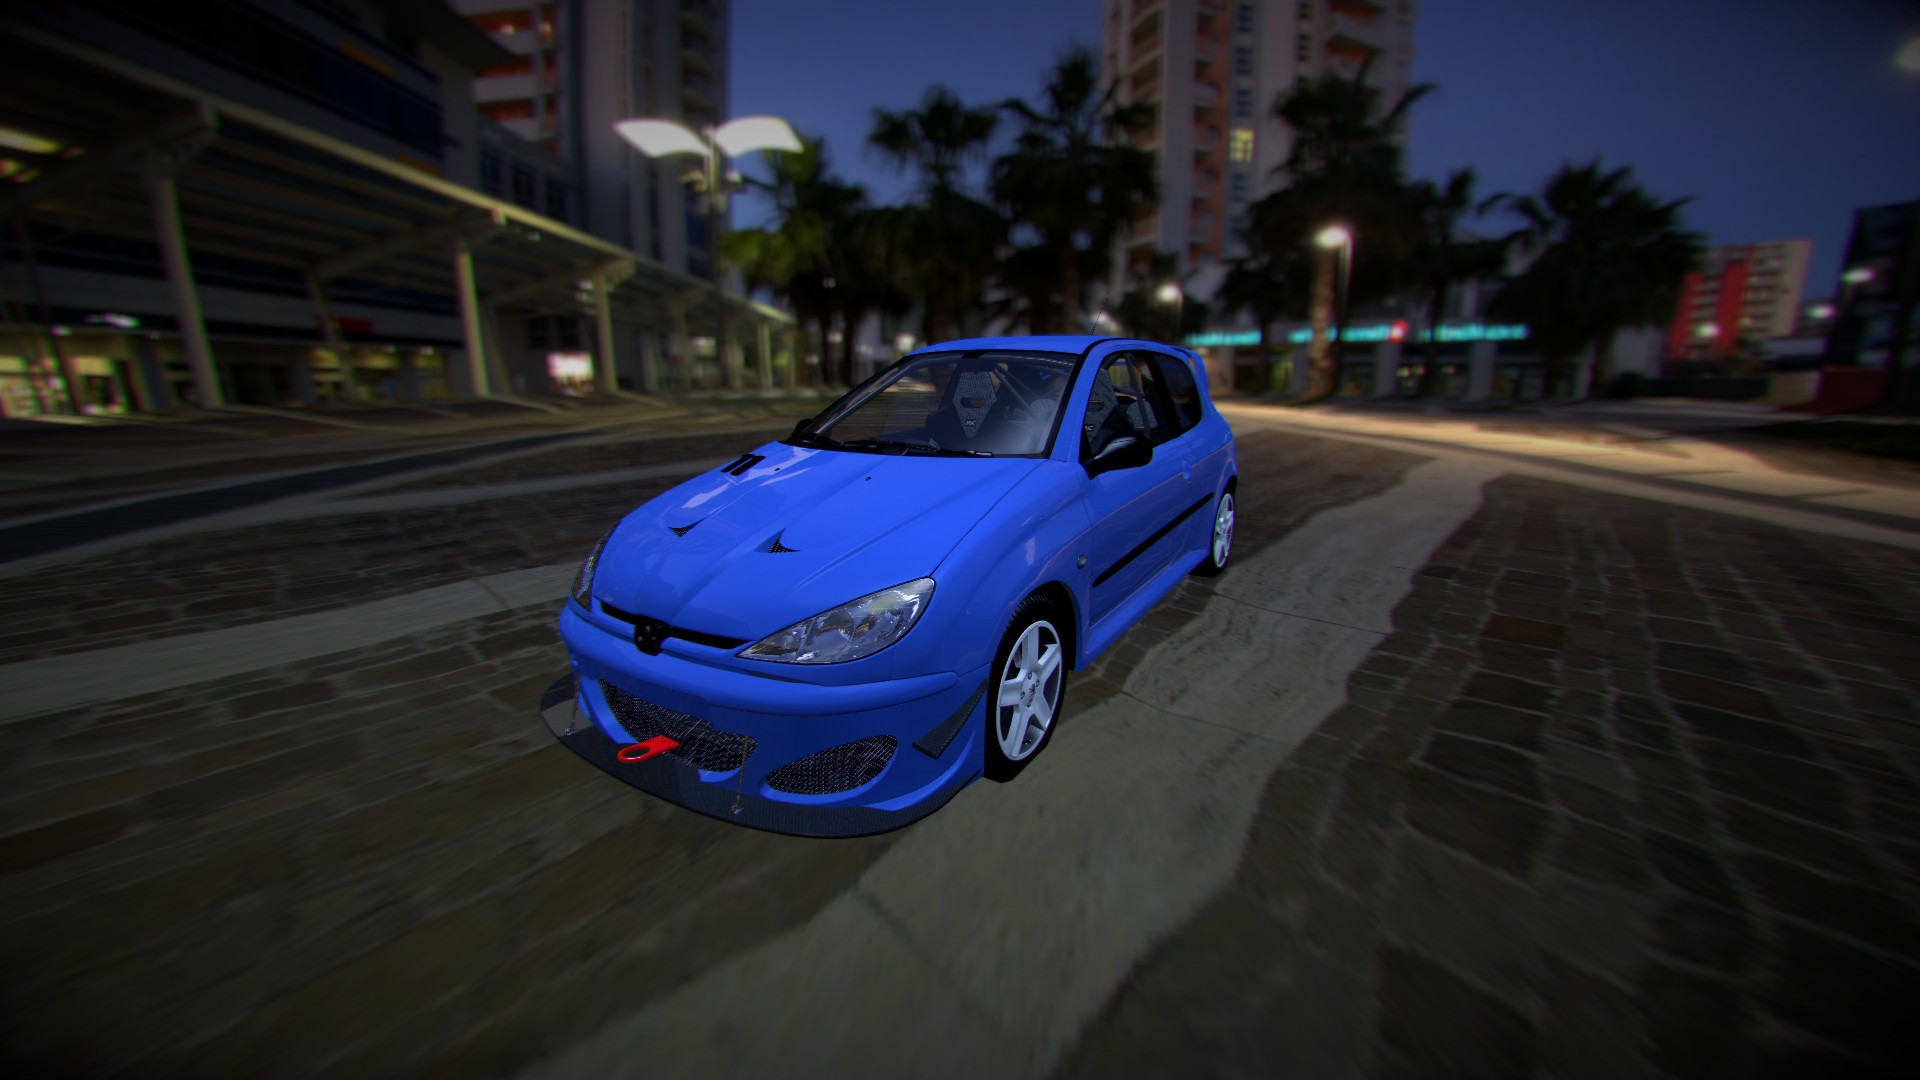 Steam Workshop :: CrSk Autos - Peugeot 206 RC '03